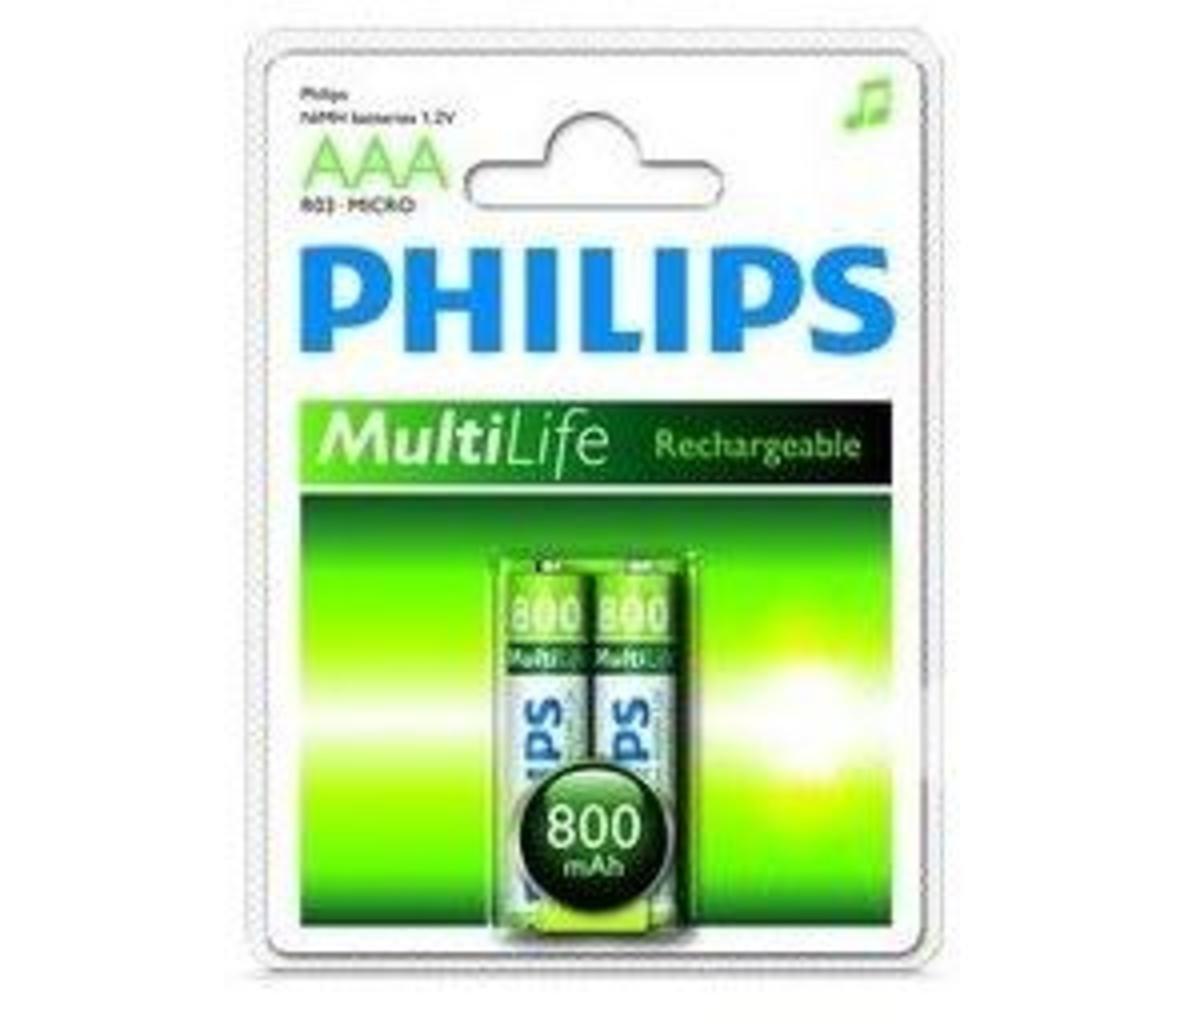 Philip 飛利浦 2粒3A800mAh充電電池, R03B2A80/97